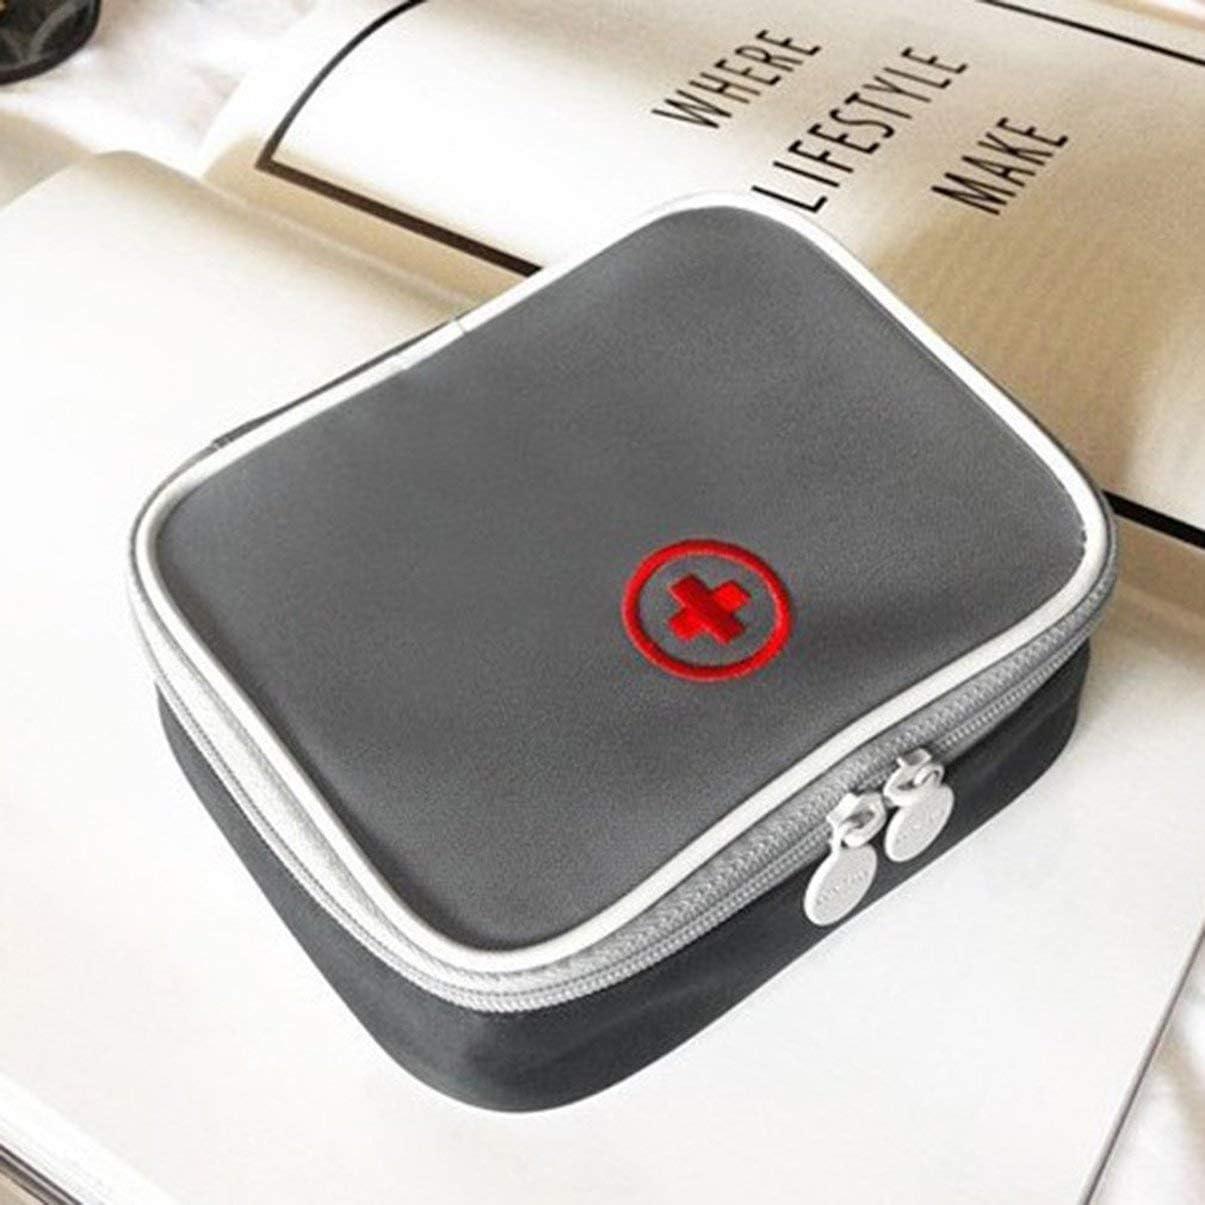 Triamisui Mini Bolsa de botiqu/ín de primeros auxilios para viaje al aire libre Paquete de medicina port/átil Bolsas de botiqu/ín de emergencia Bolsa de almacenamiento de pastillas Peque/ño organizador